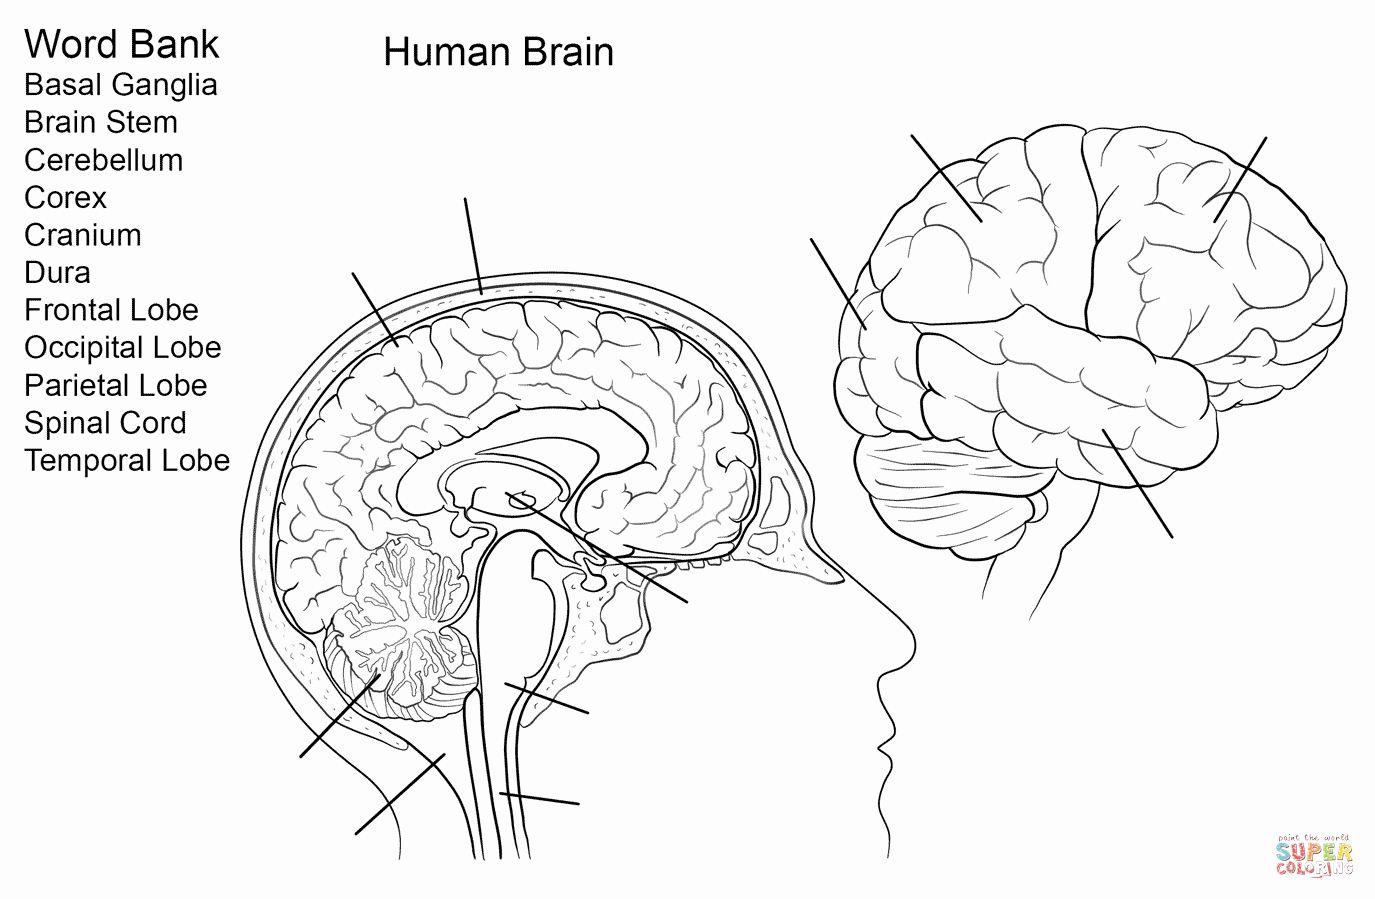 The Human Brain Coloring Book Inspirational Human Brain